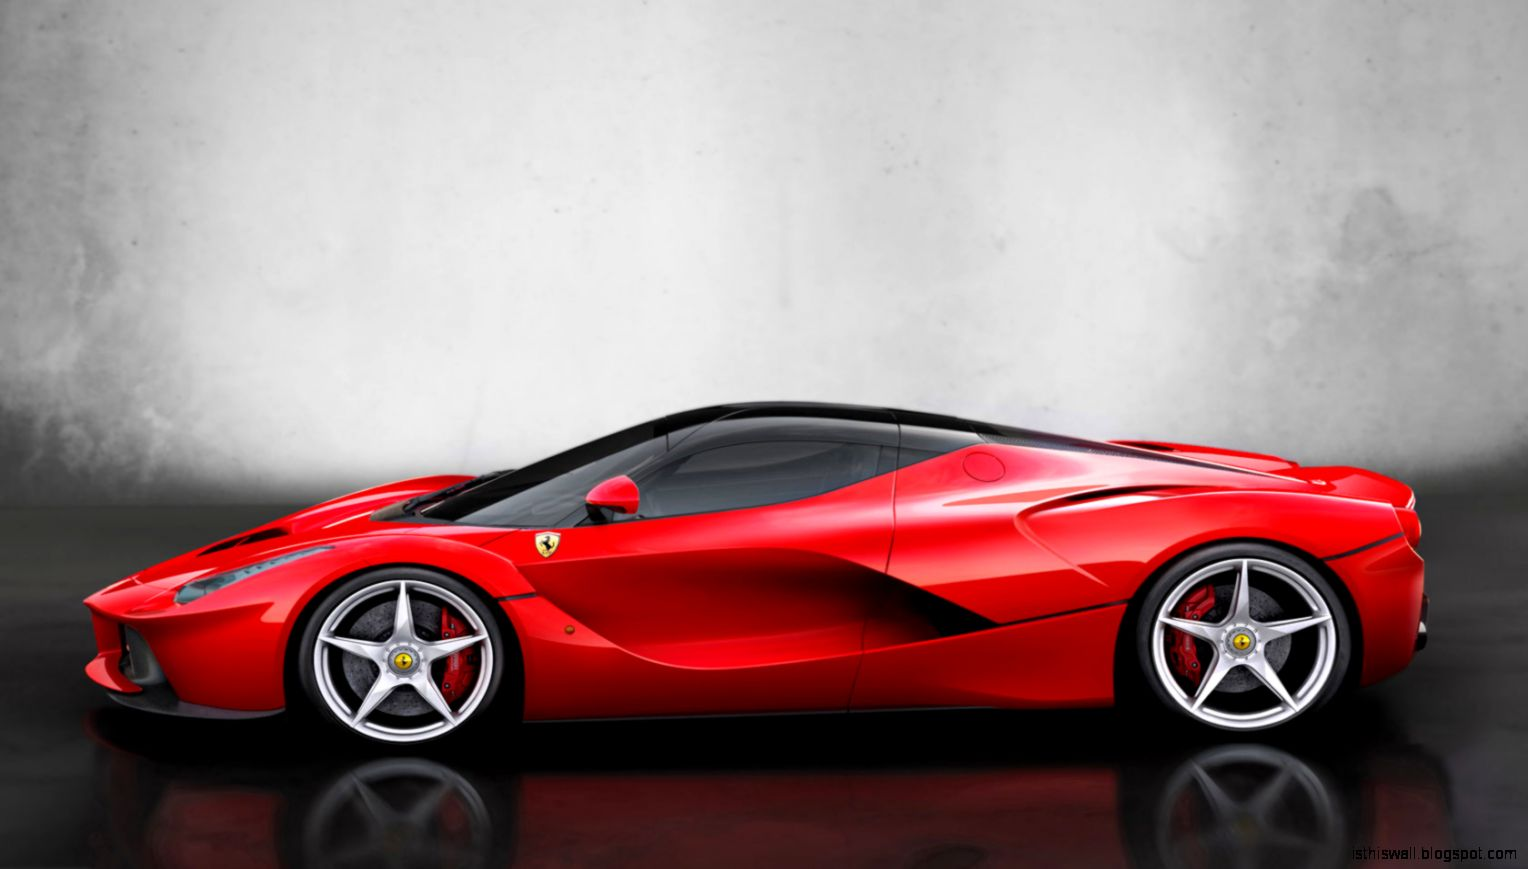 Ferrari LaFerrari Wallpaper » Infinite Garage